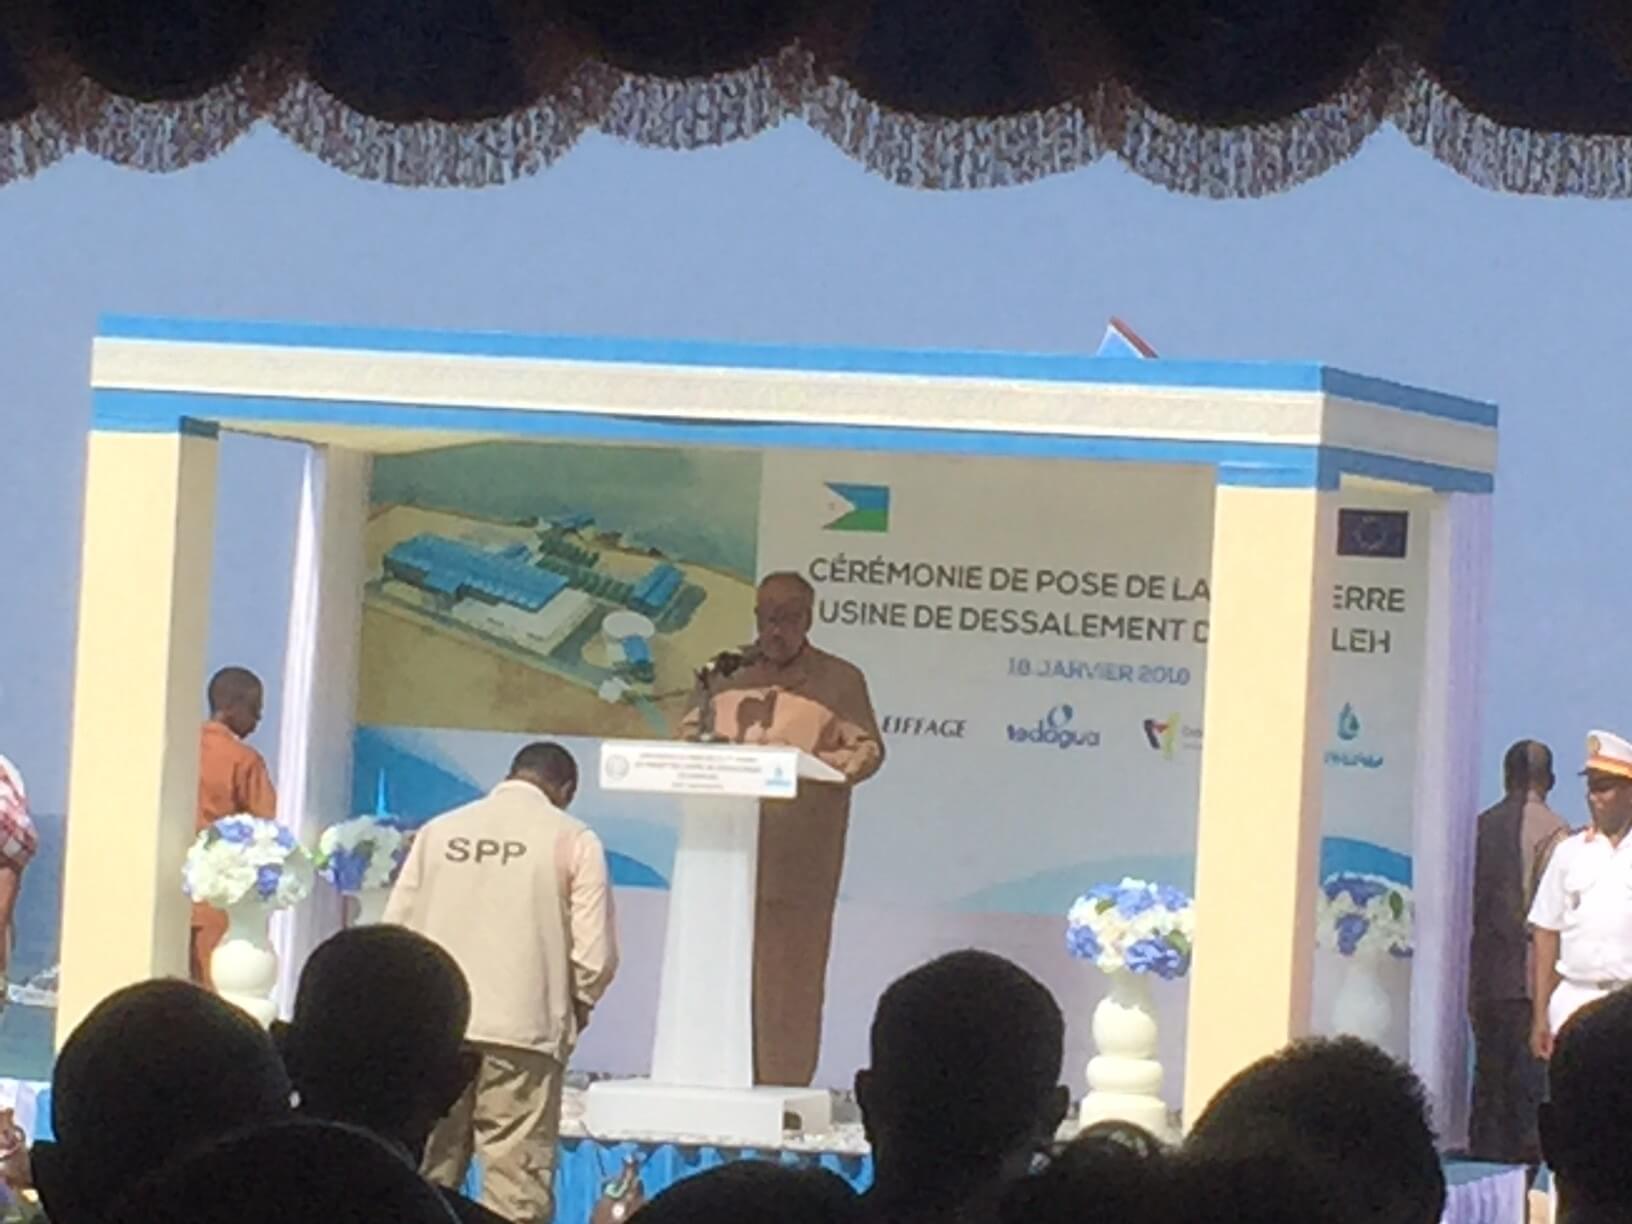 Djibouti desalination President Ismael Omar Guelleh Speach